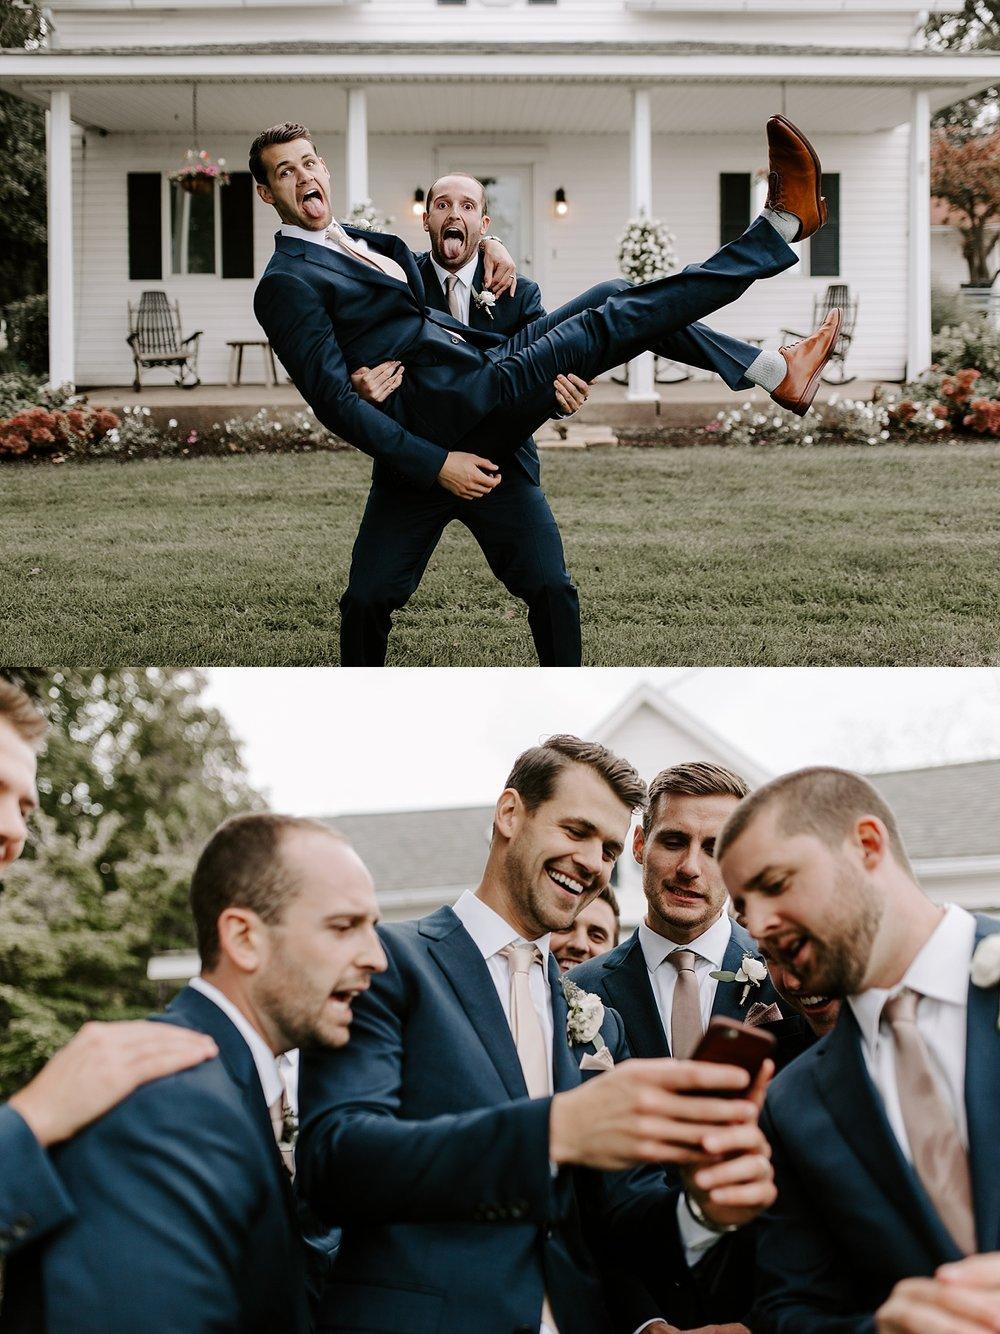 12ashley-sara-photography-pittsburgh-photographer-wedding-photographer-brookside-farm-wedding-louisville-ohio.jpg